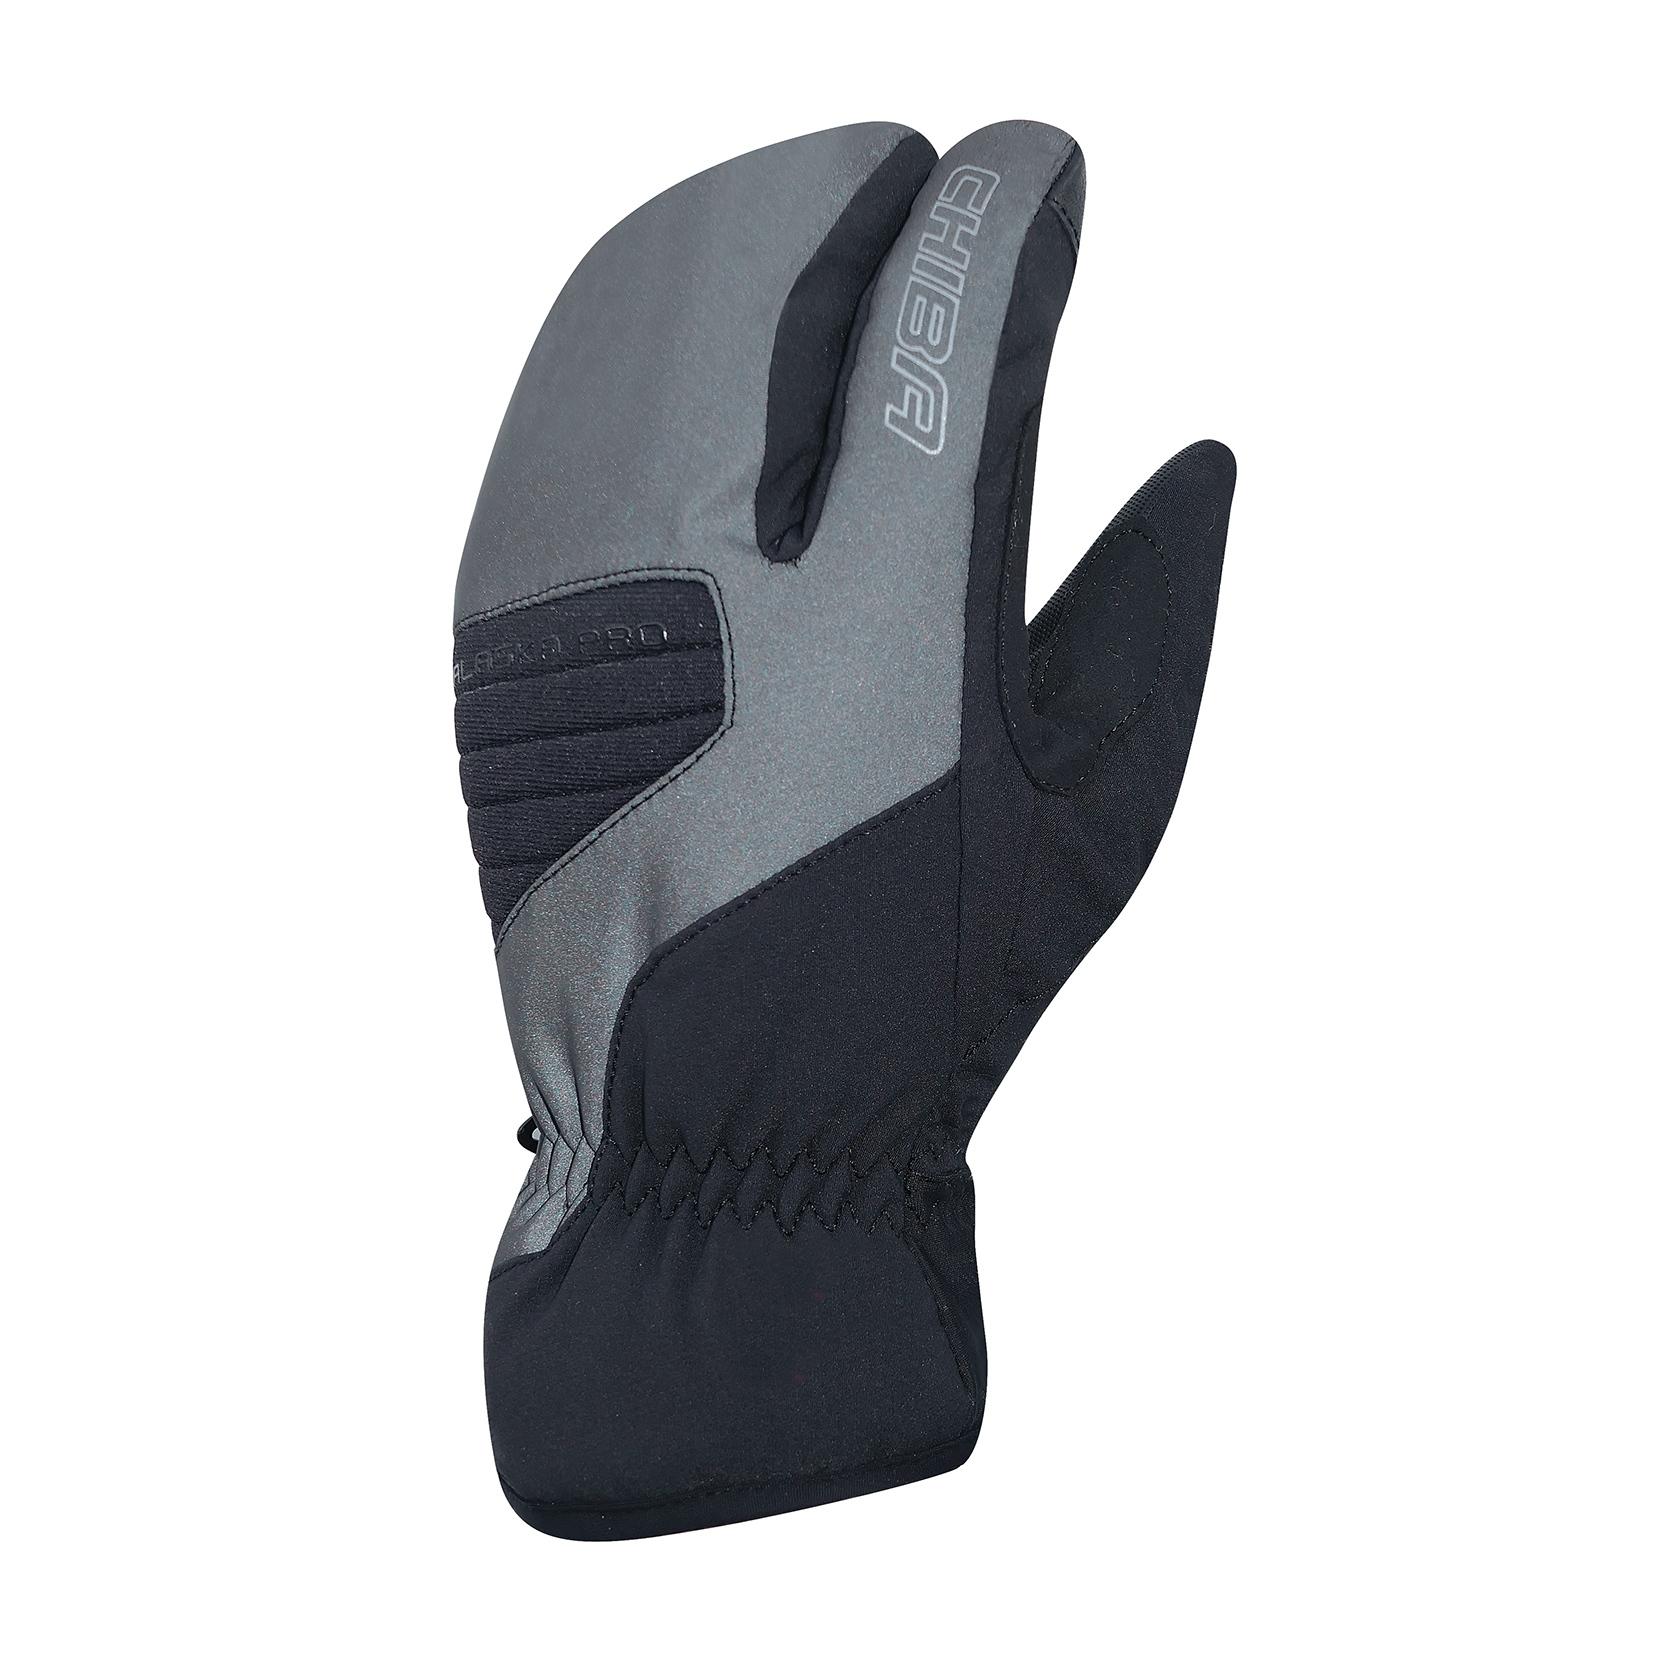 Chiba Alaska Pro Cycling Gloves - black reflective